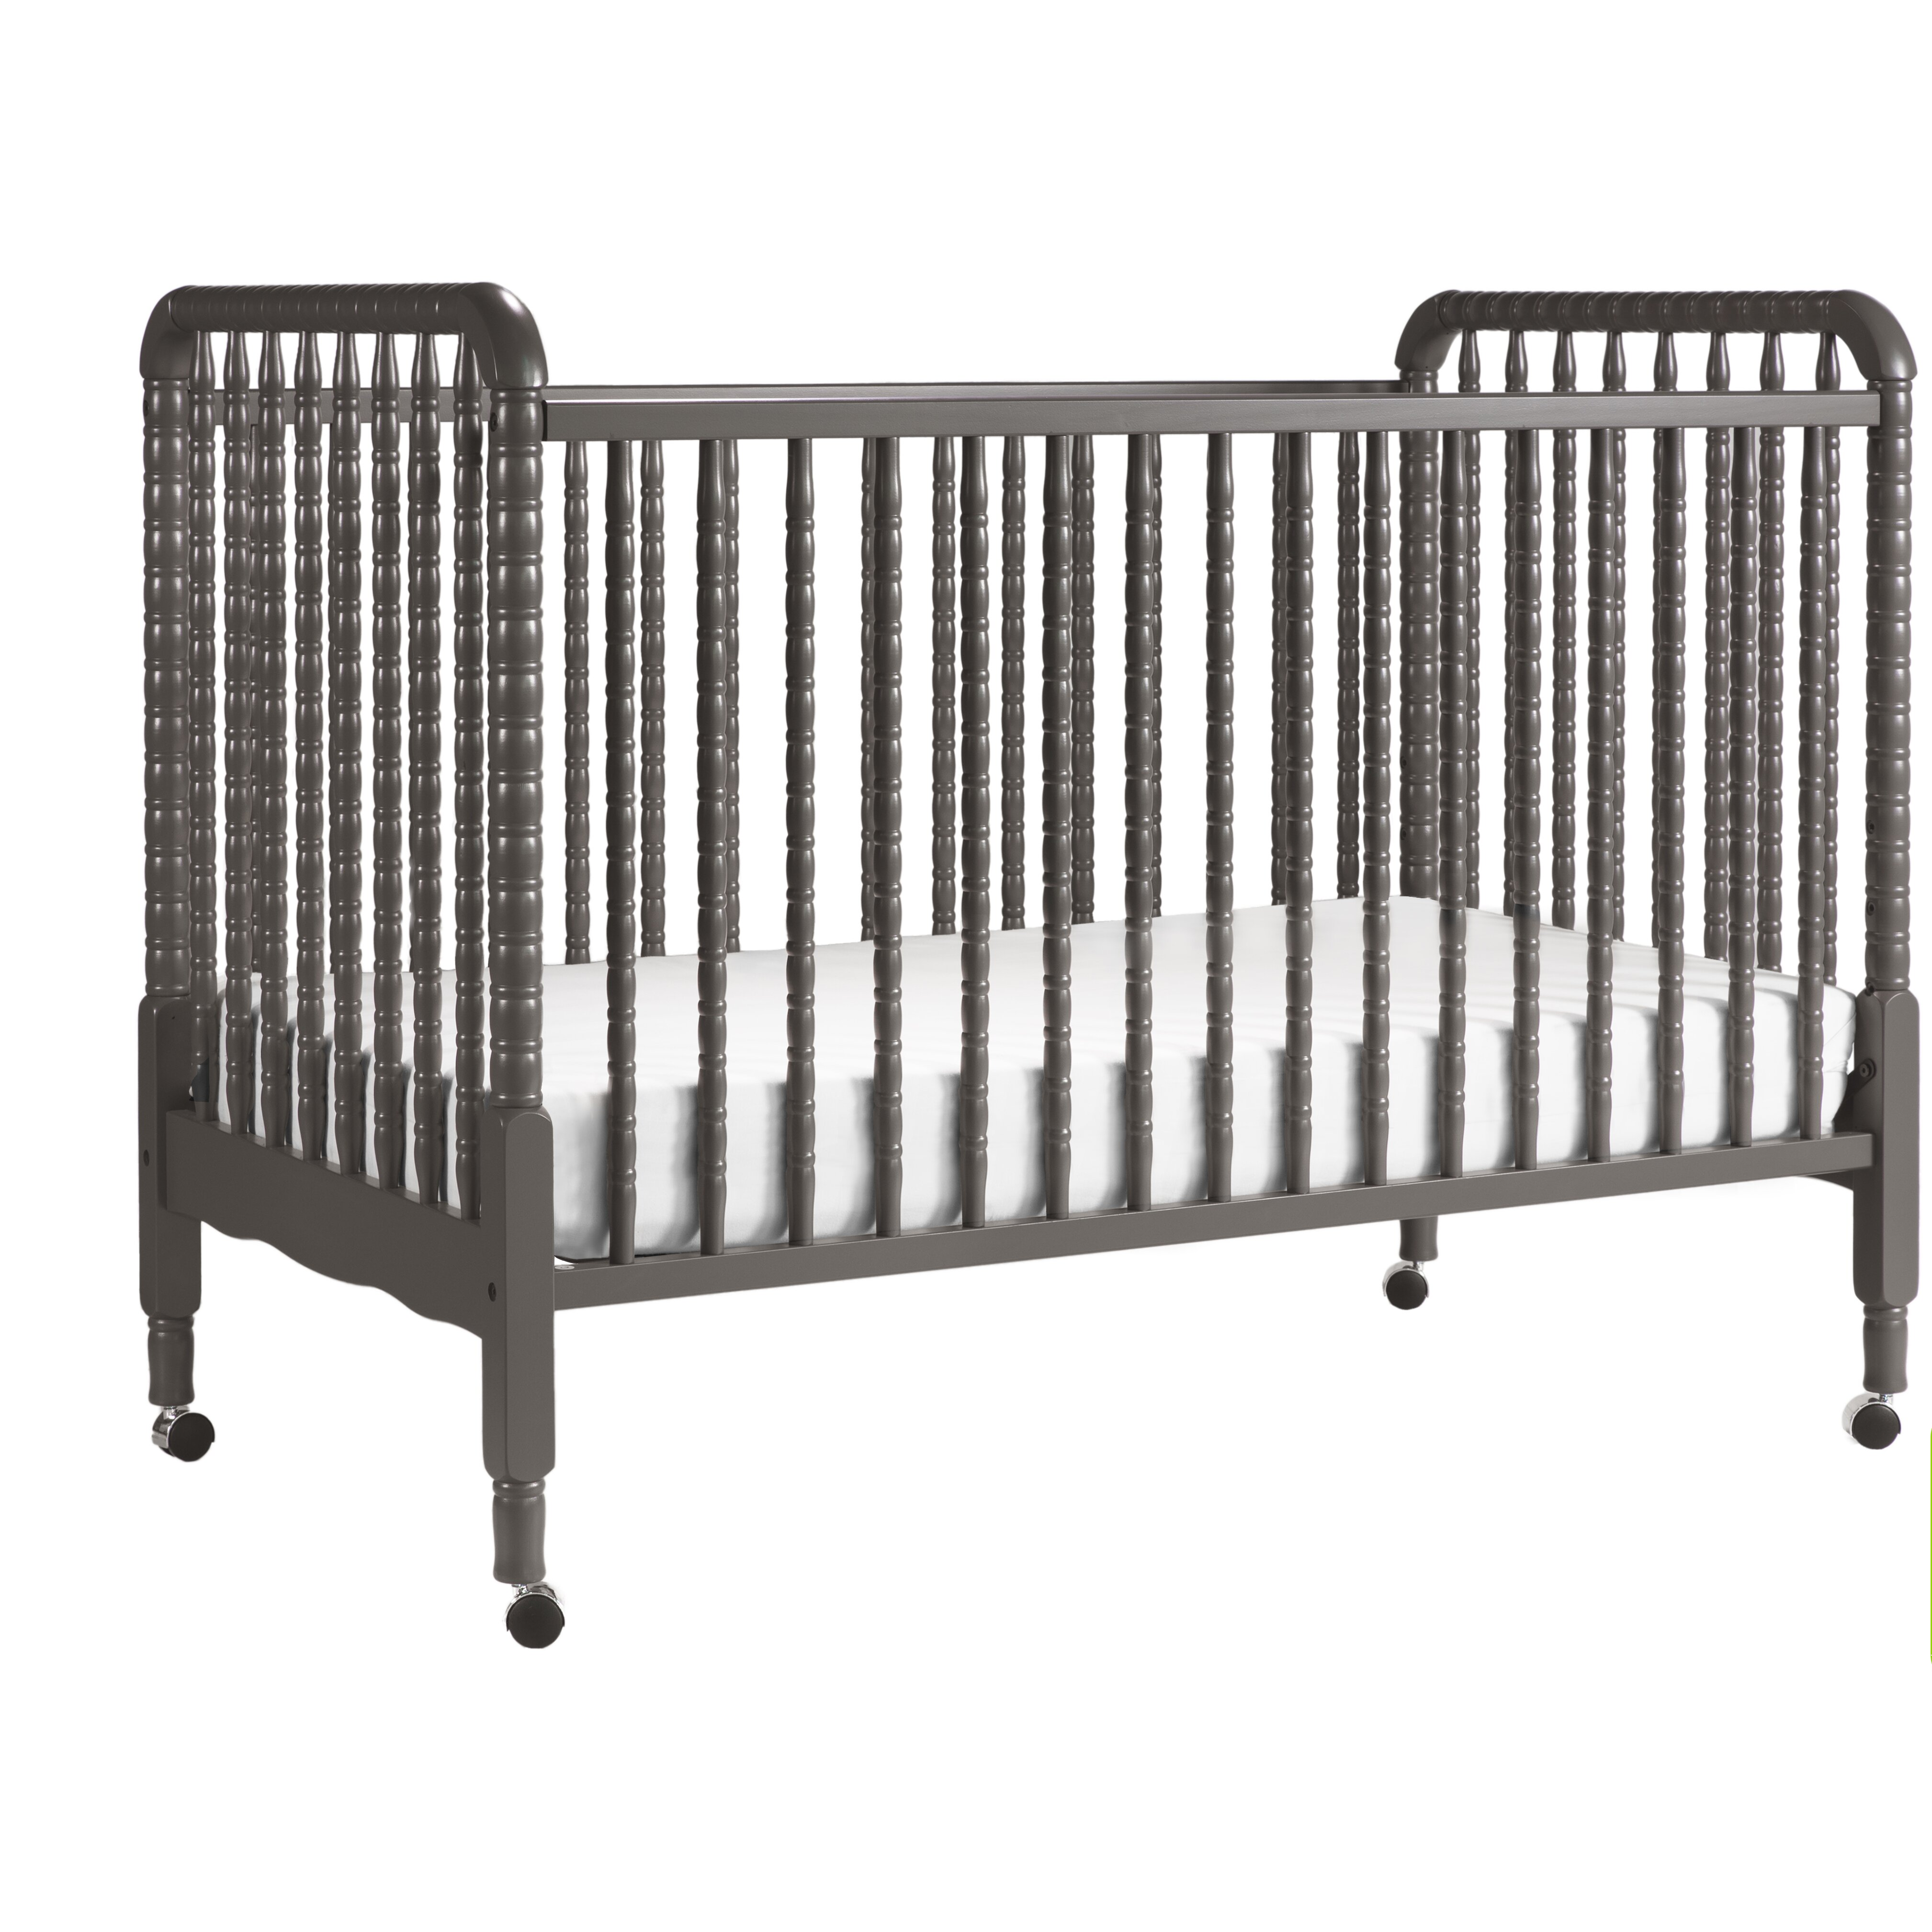 Crib for sale bacolod - Davinci Jenny Lind 3 In 1 Convertible Crib